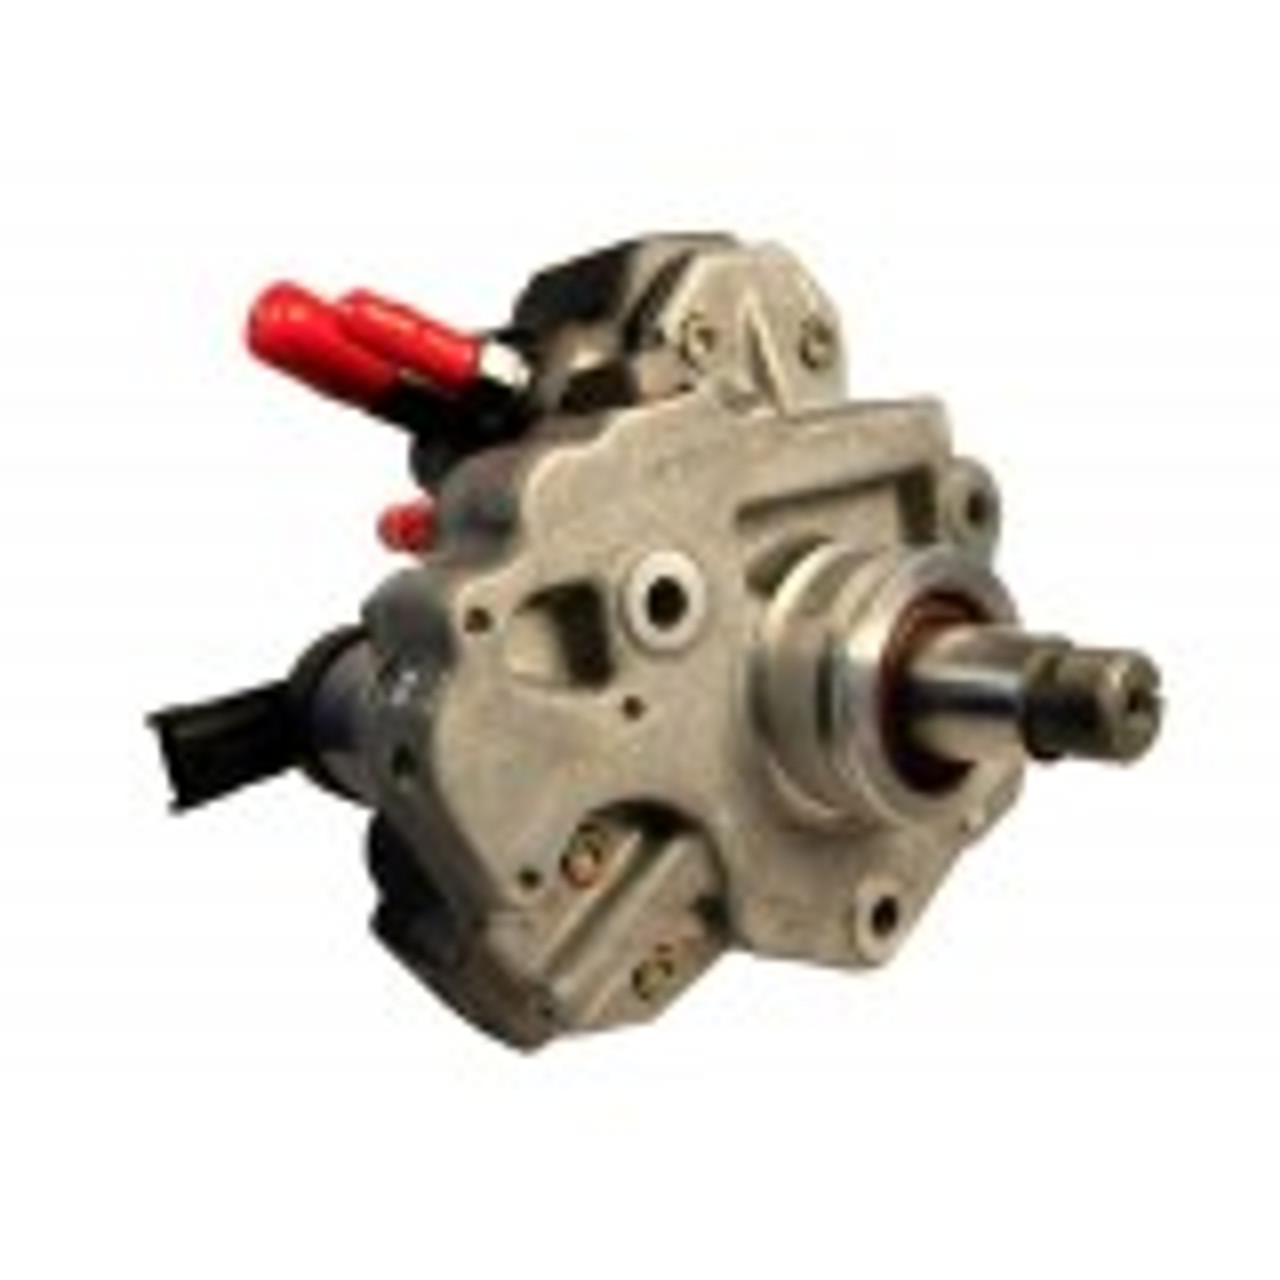 Exergy E04-40106 10mm Stroker CP4 Pump | 11-17 Ford 6.7L Powerstroke